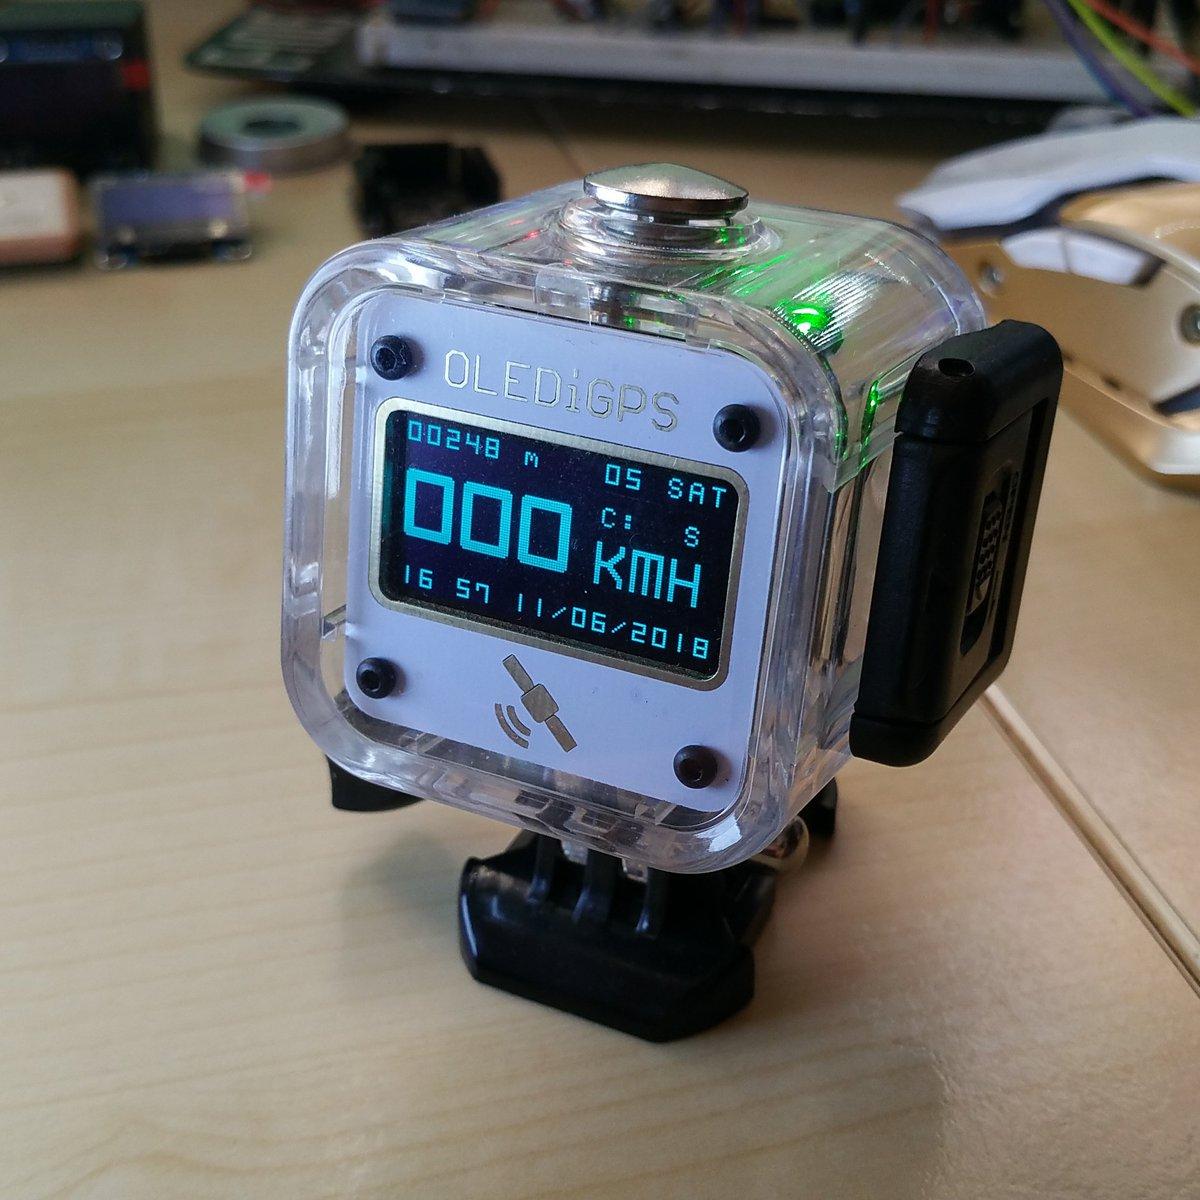 Olediuno Gps Cube From Phoenix Cnc On Tindie Volt Meter Small Digital Led Display Charging Circuit Monitor Ebay